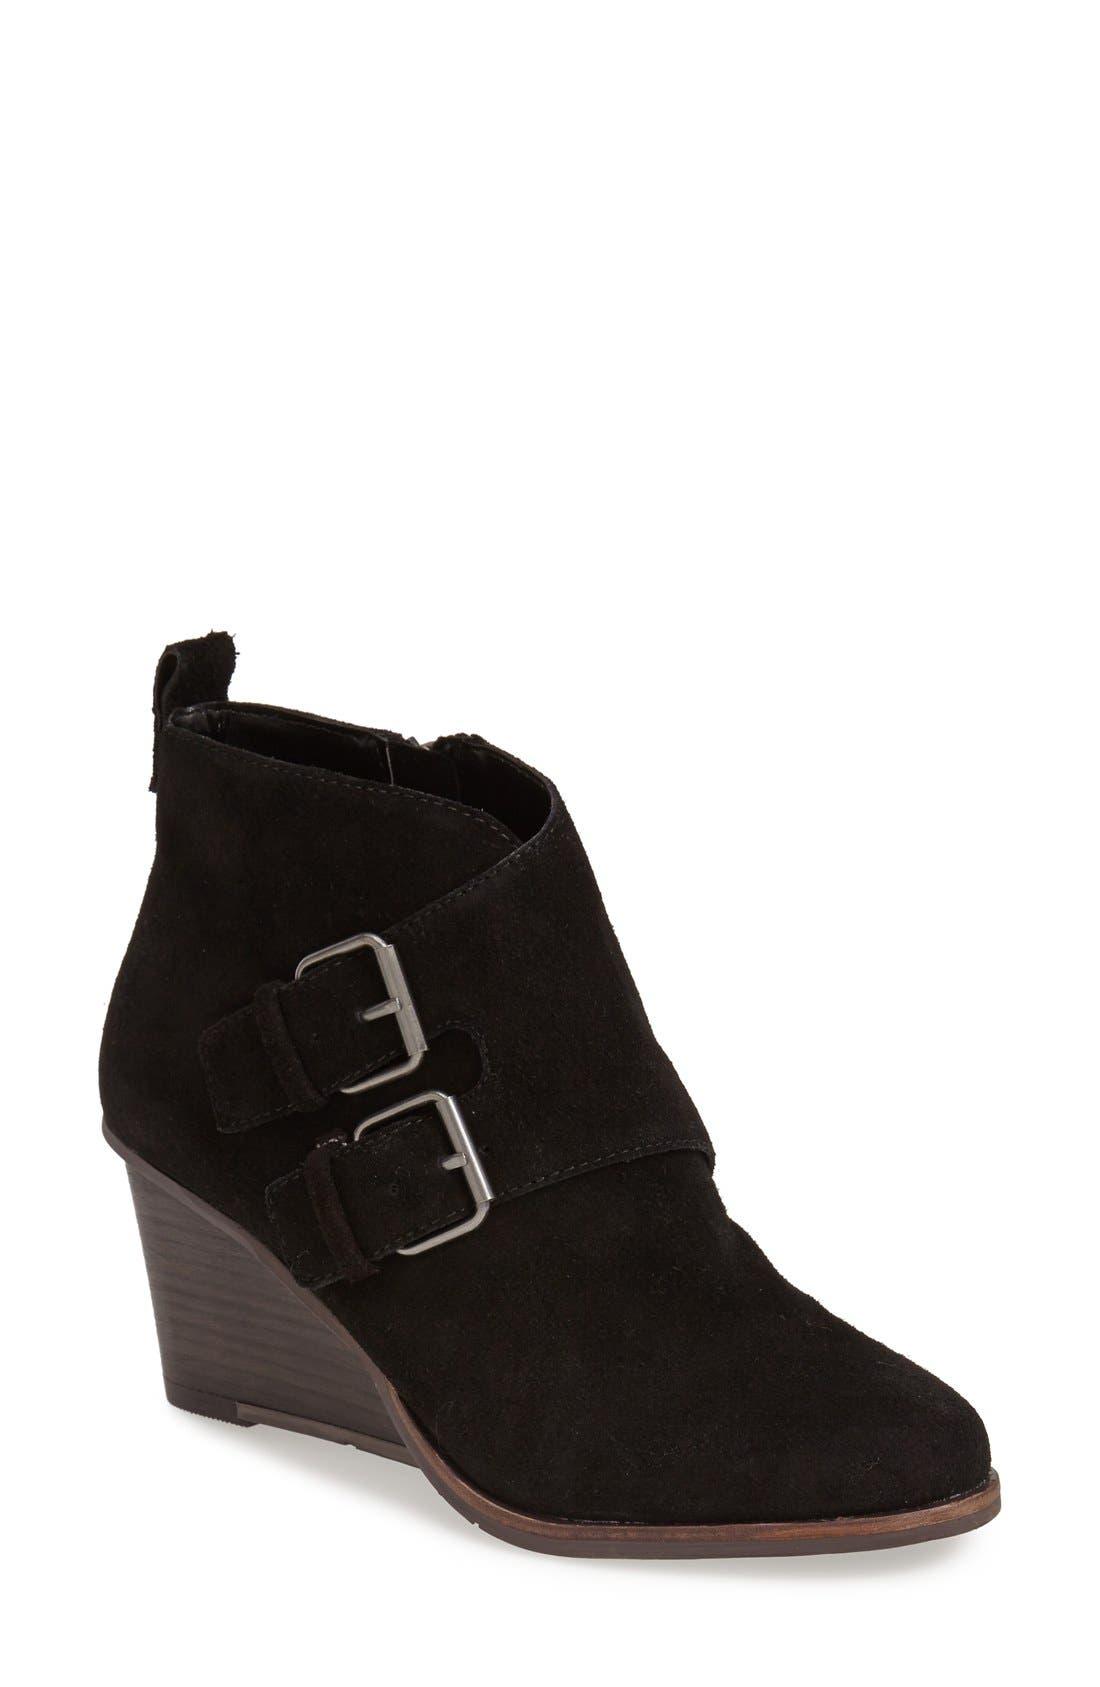 DV Footwear 'Fabian' Monk Strap Wedge Bootie,                             Main thumbnail 1, color,                             001